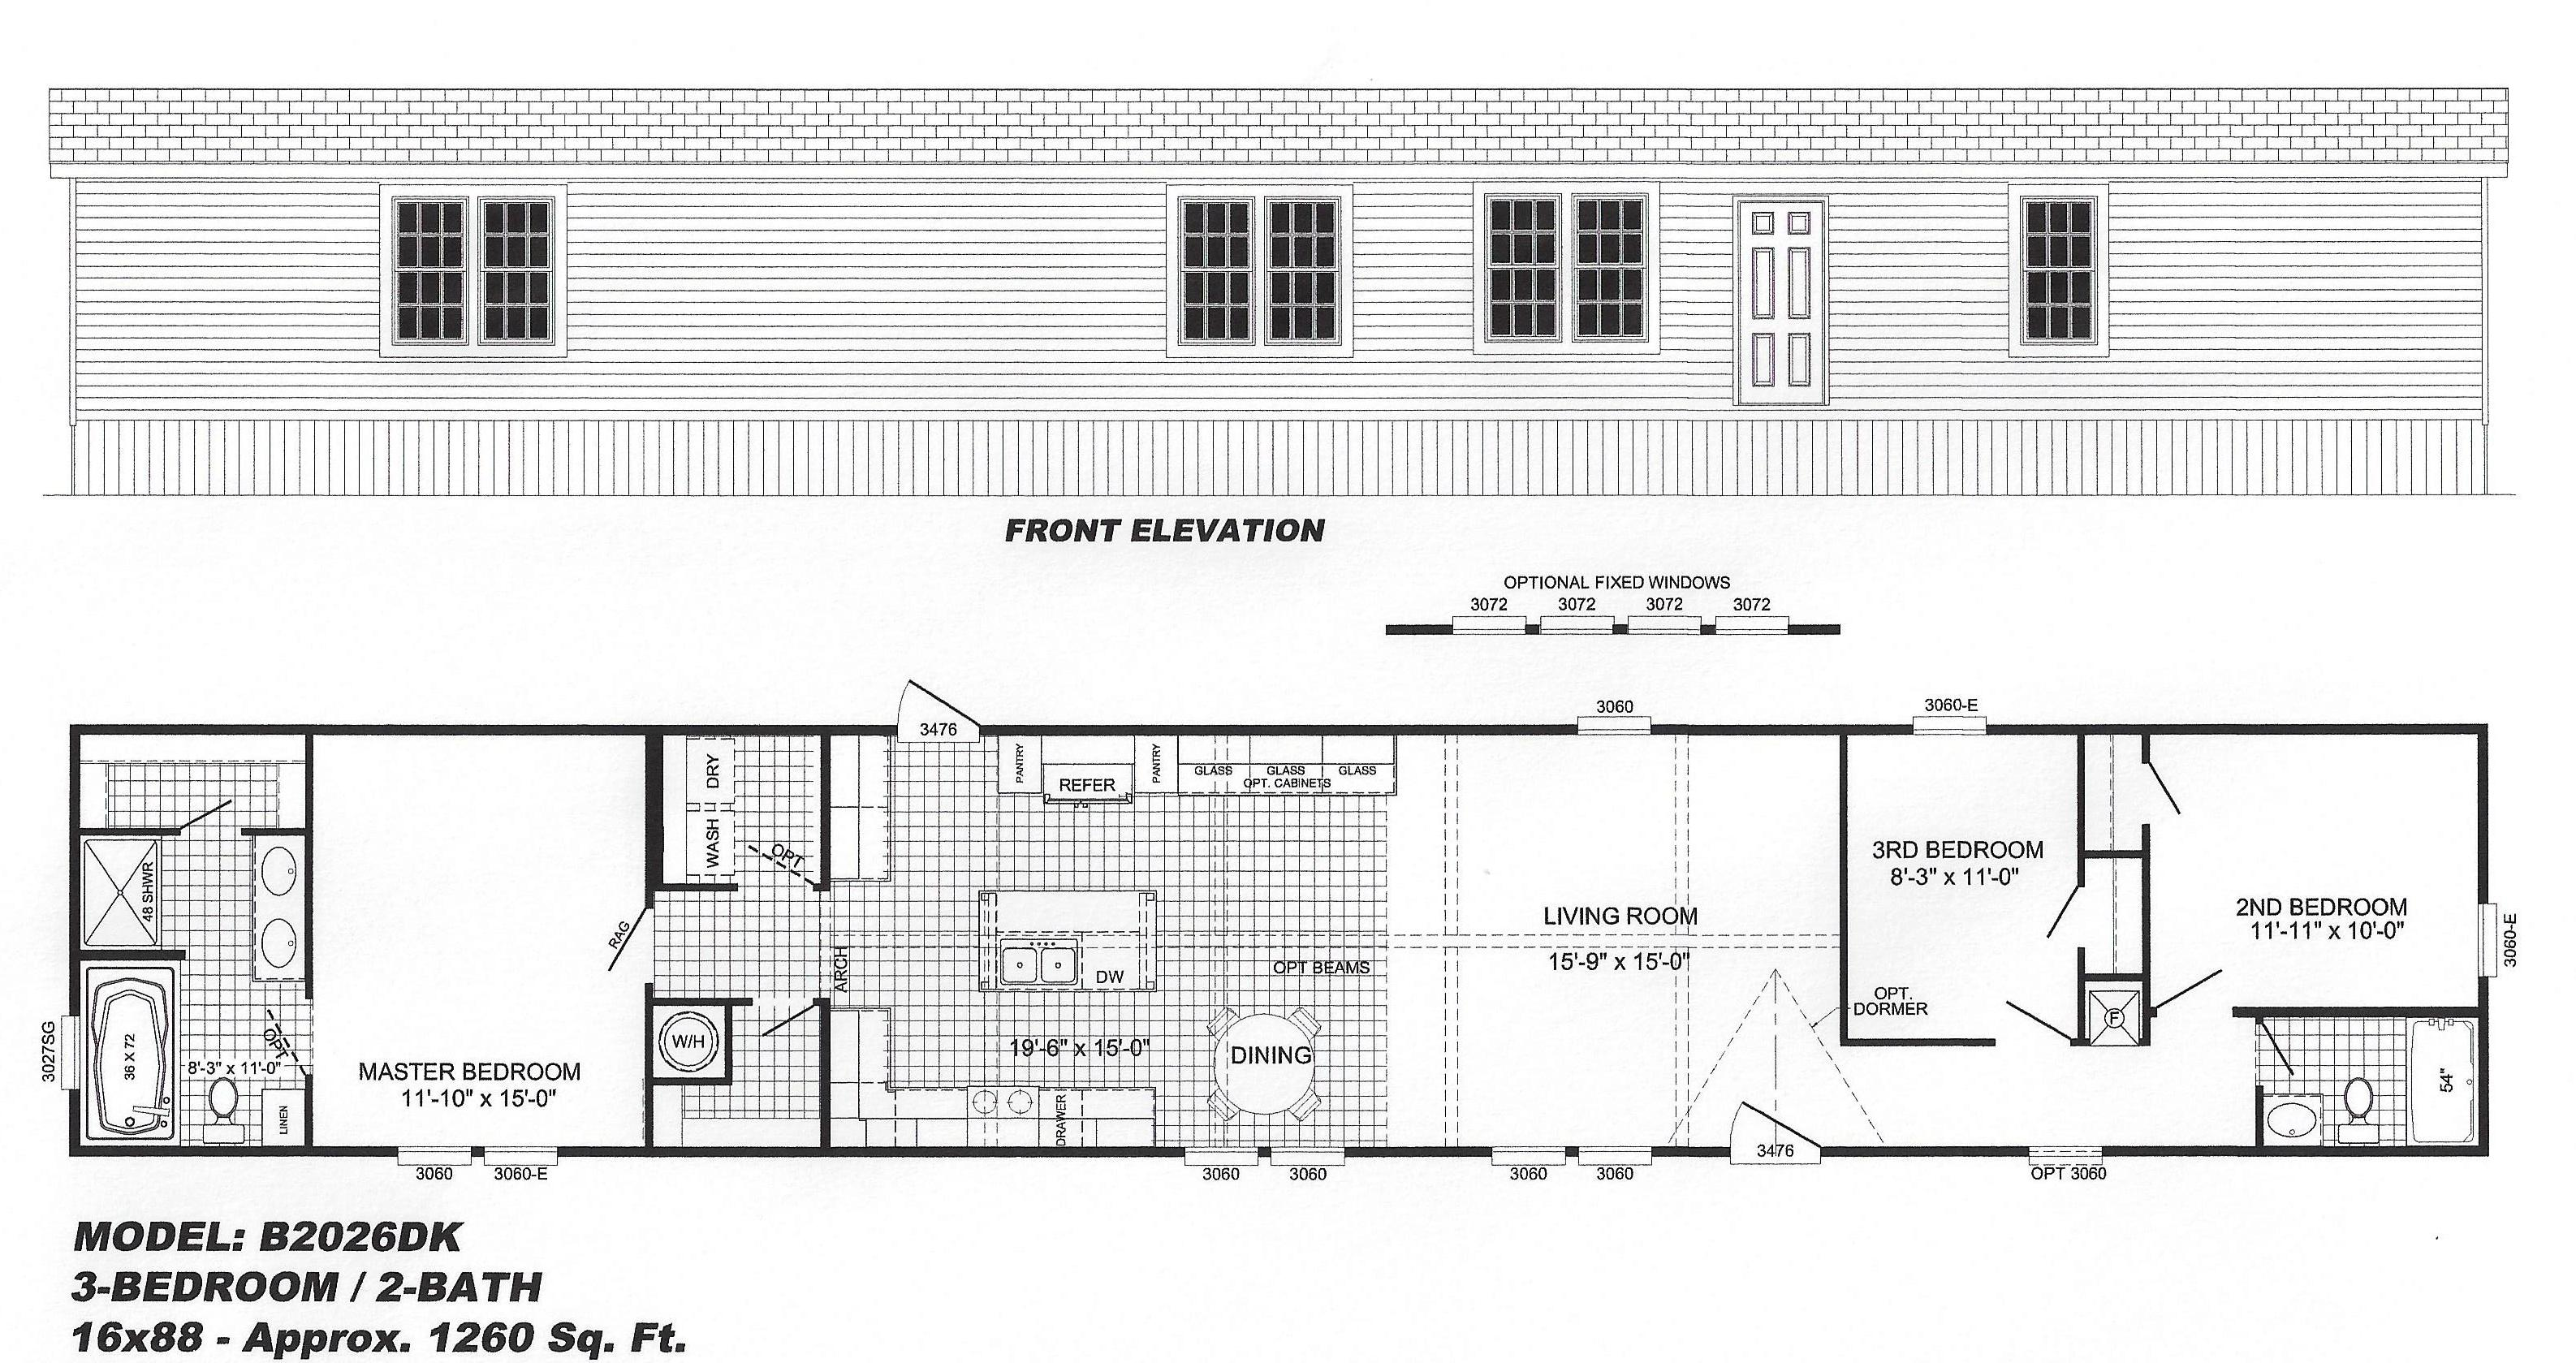 3 bedroom floor plan b2026  hawks homes  manufactured